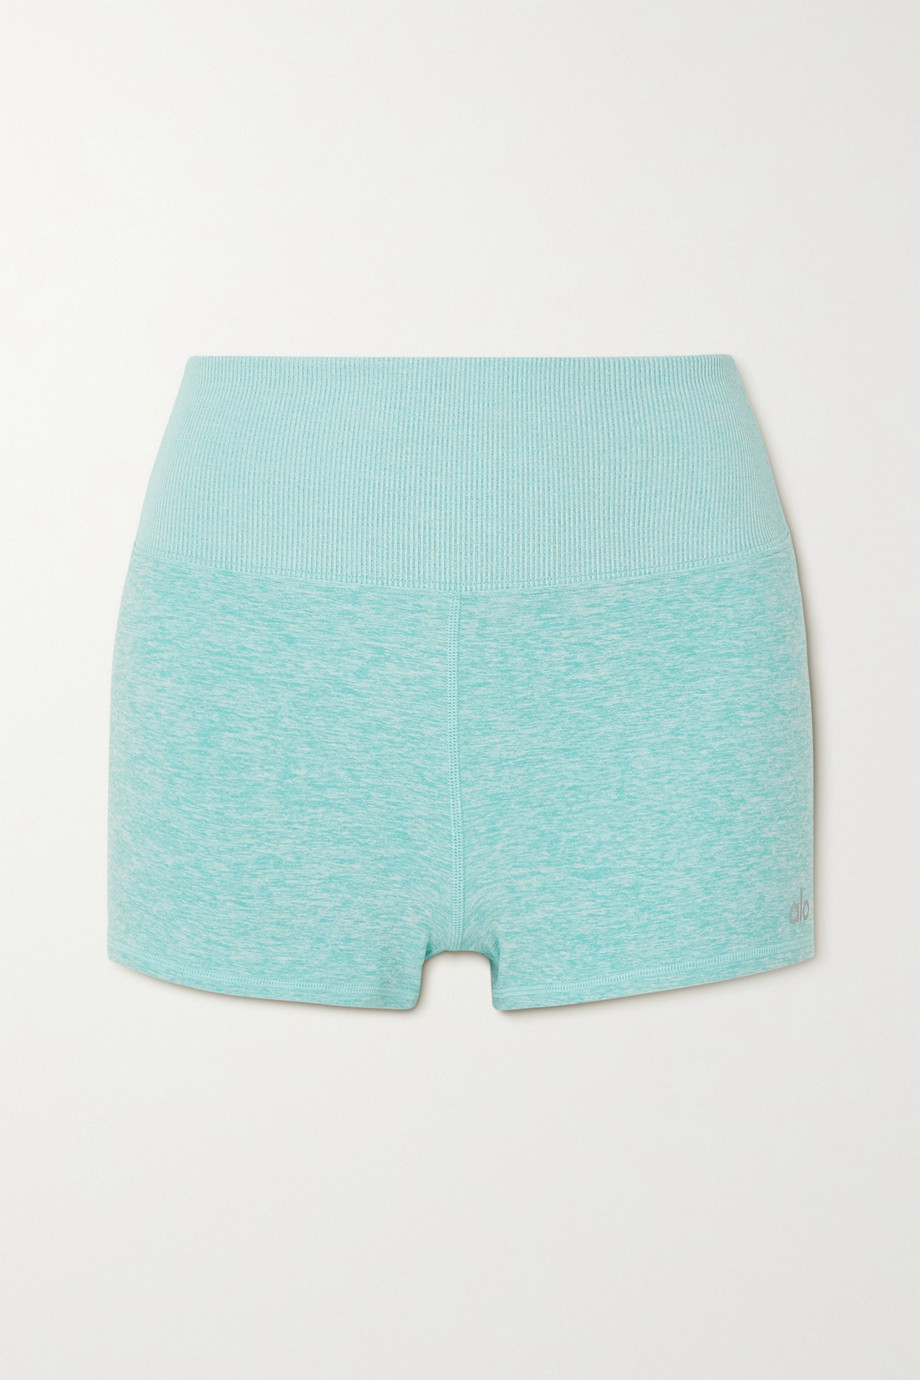 Alo Yoga Aura stretch-jersey shorts